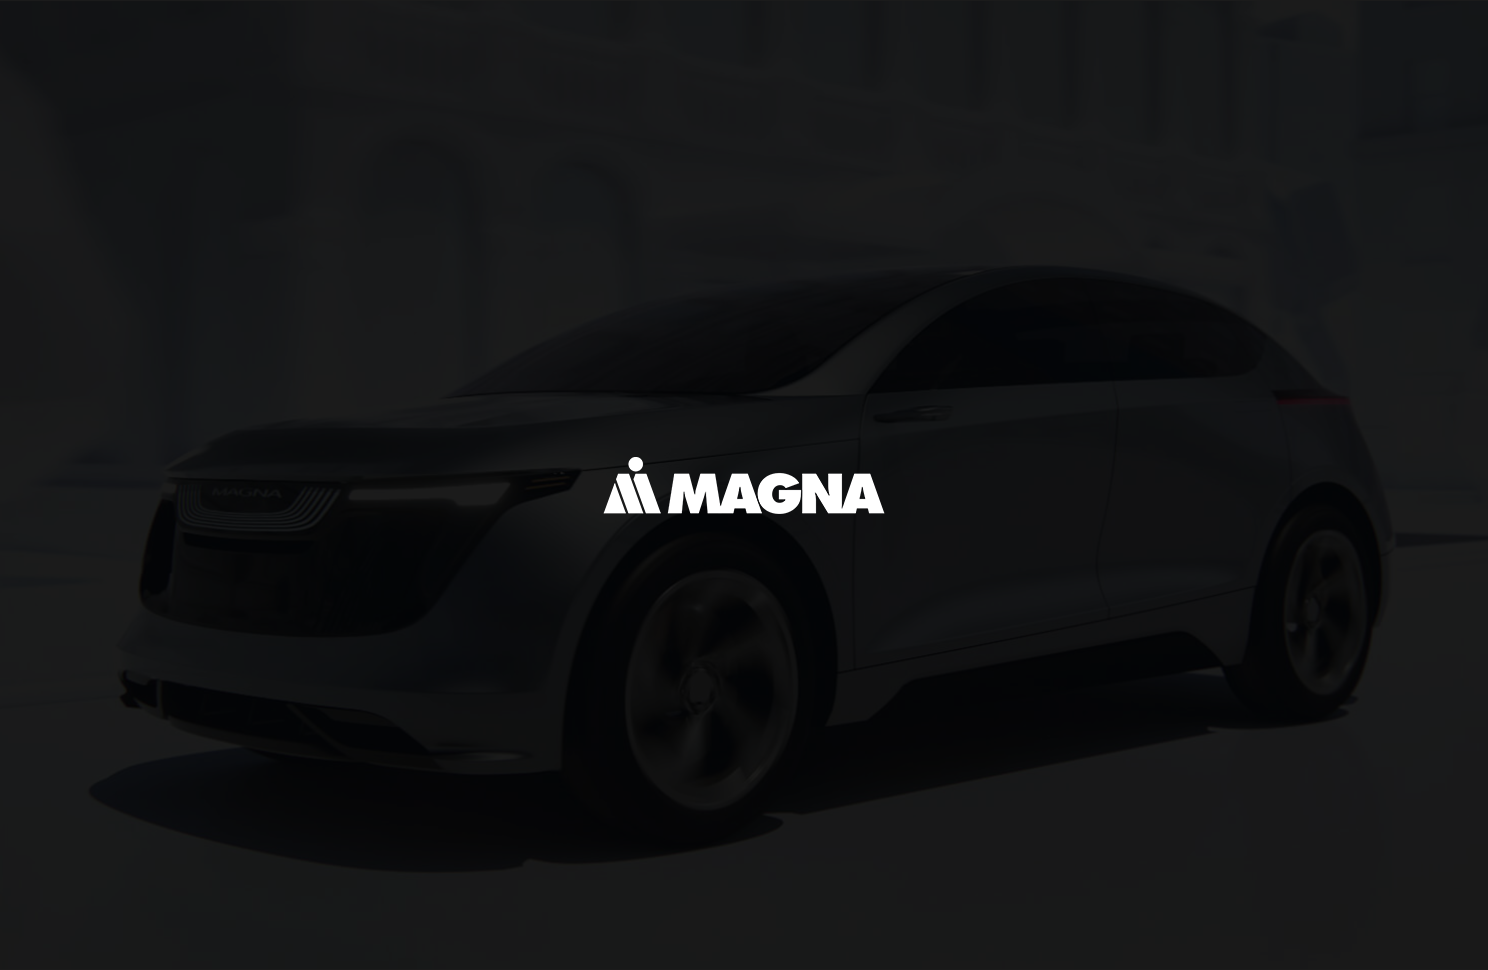 Magna logo on a dark backgroud